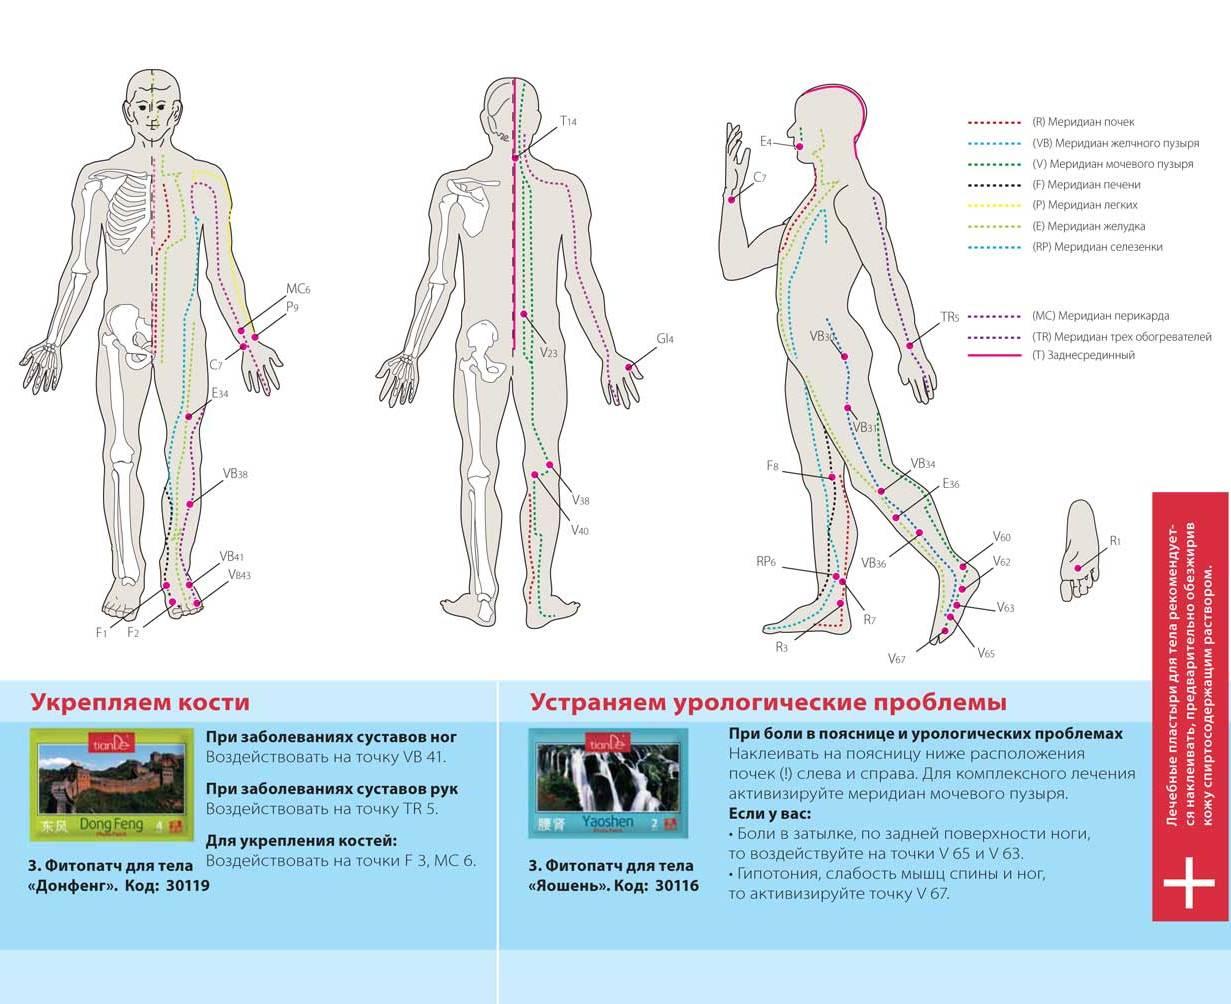 Заболевание печени схема лечения